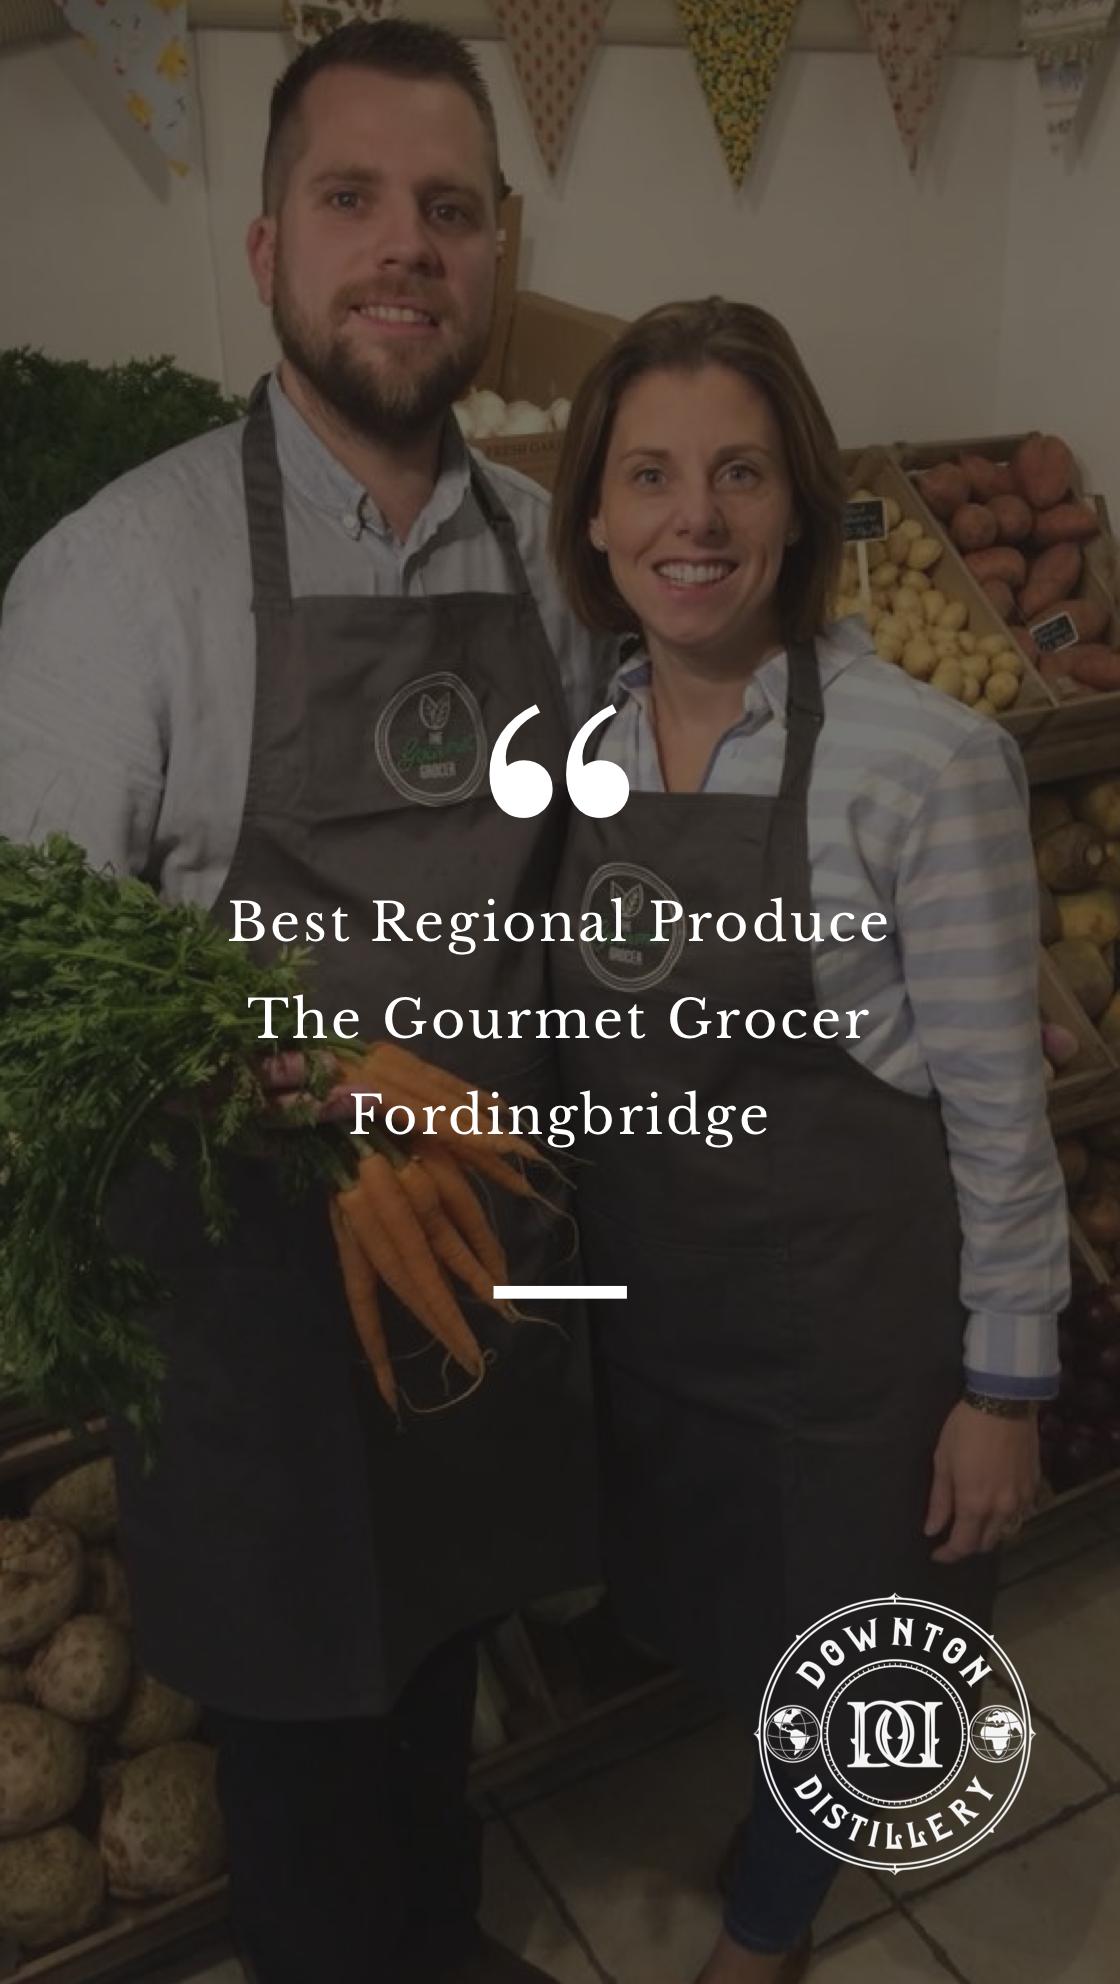 Gourmet Grocer Fordingbridge